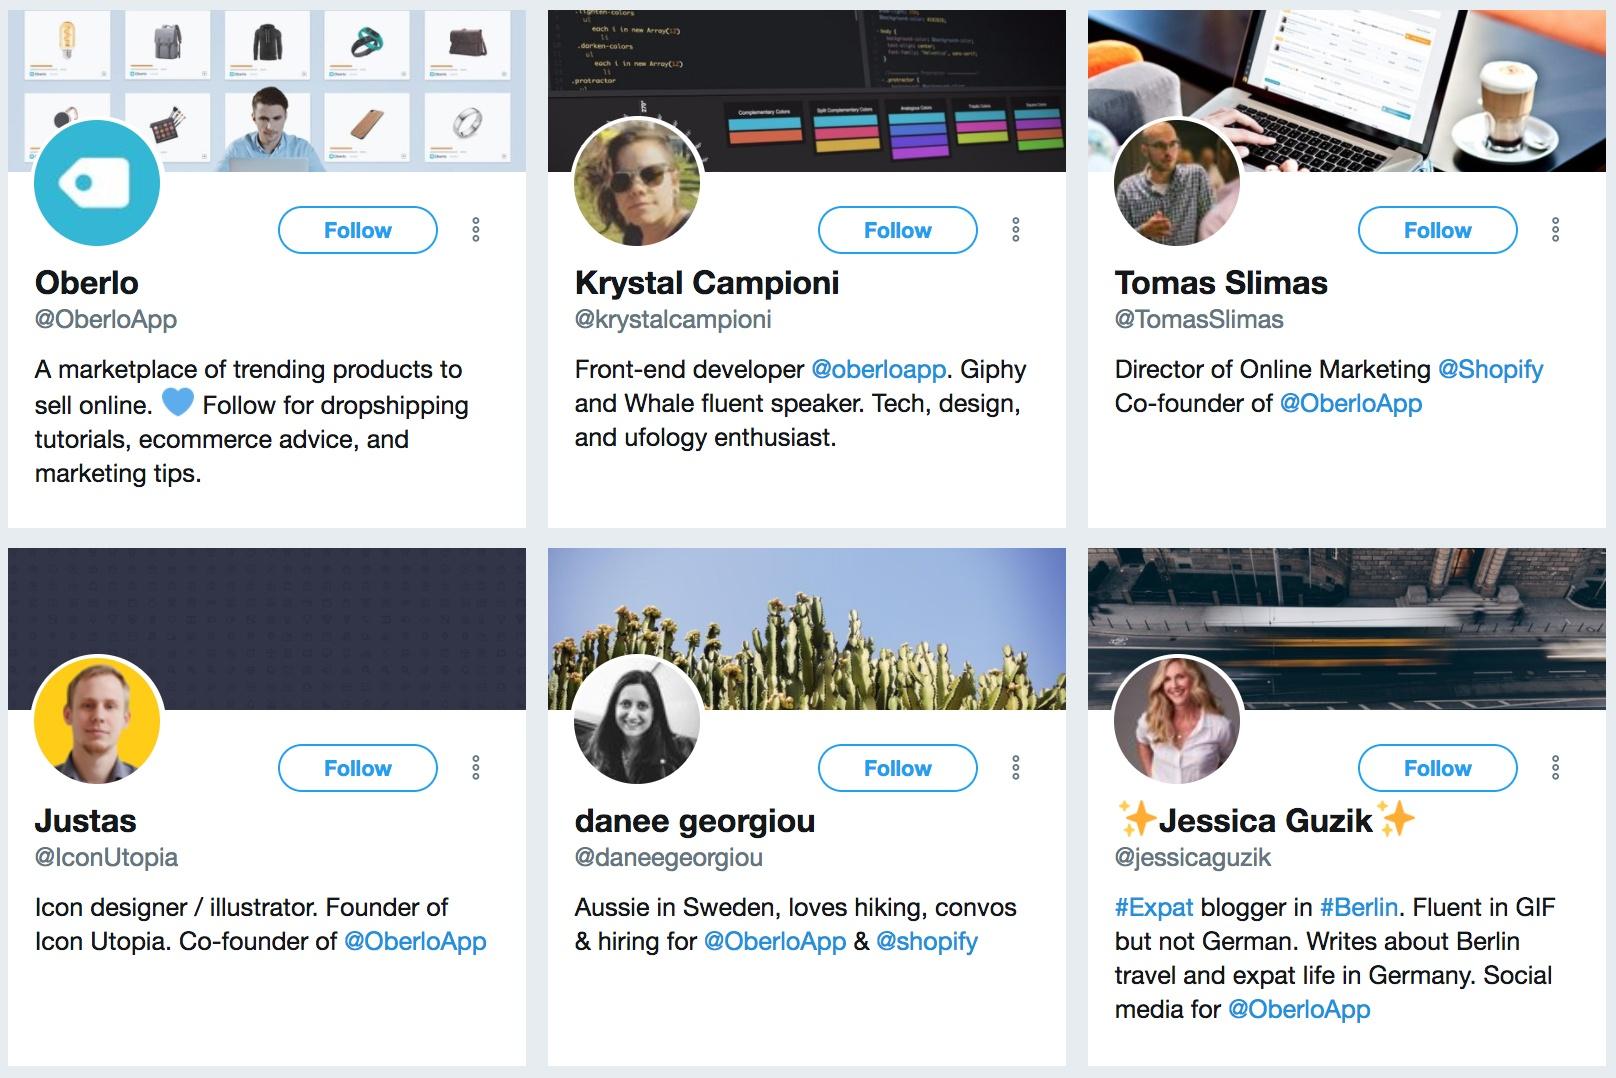 oberlo app in bio - How to gain followers on twitter